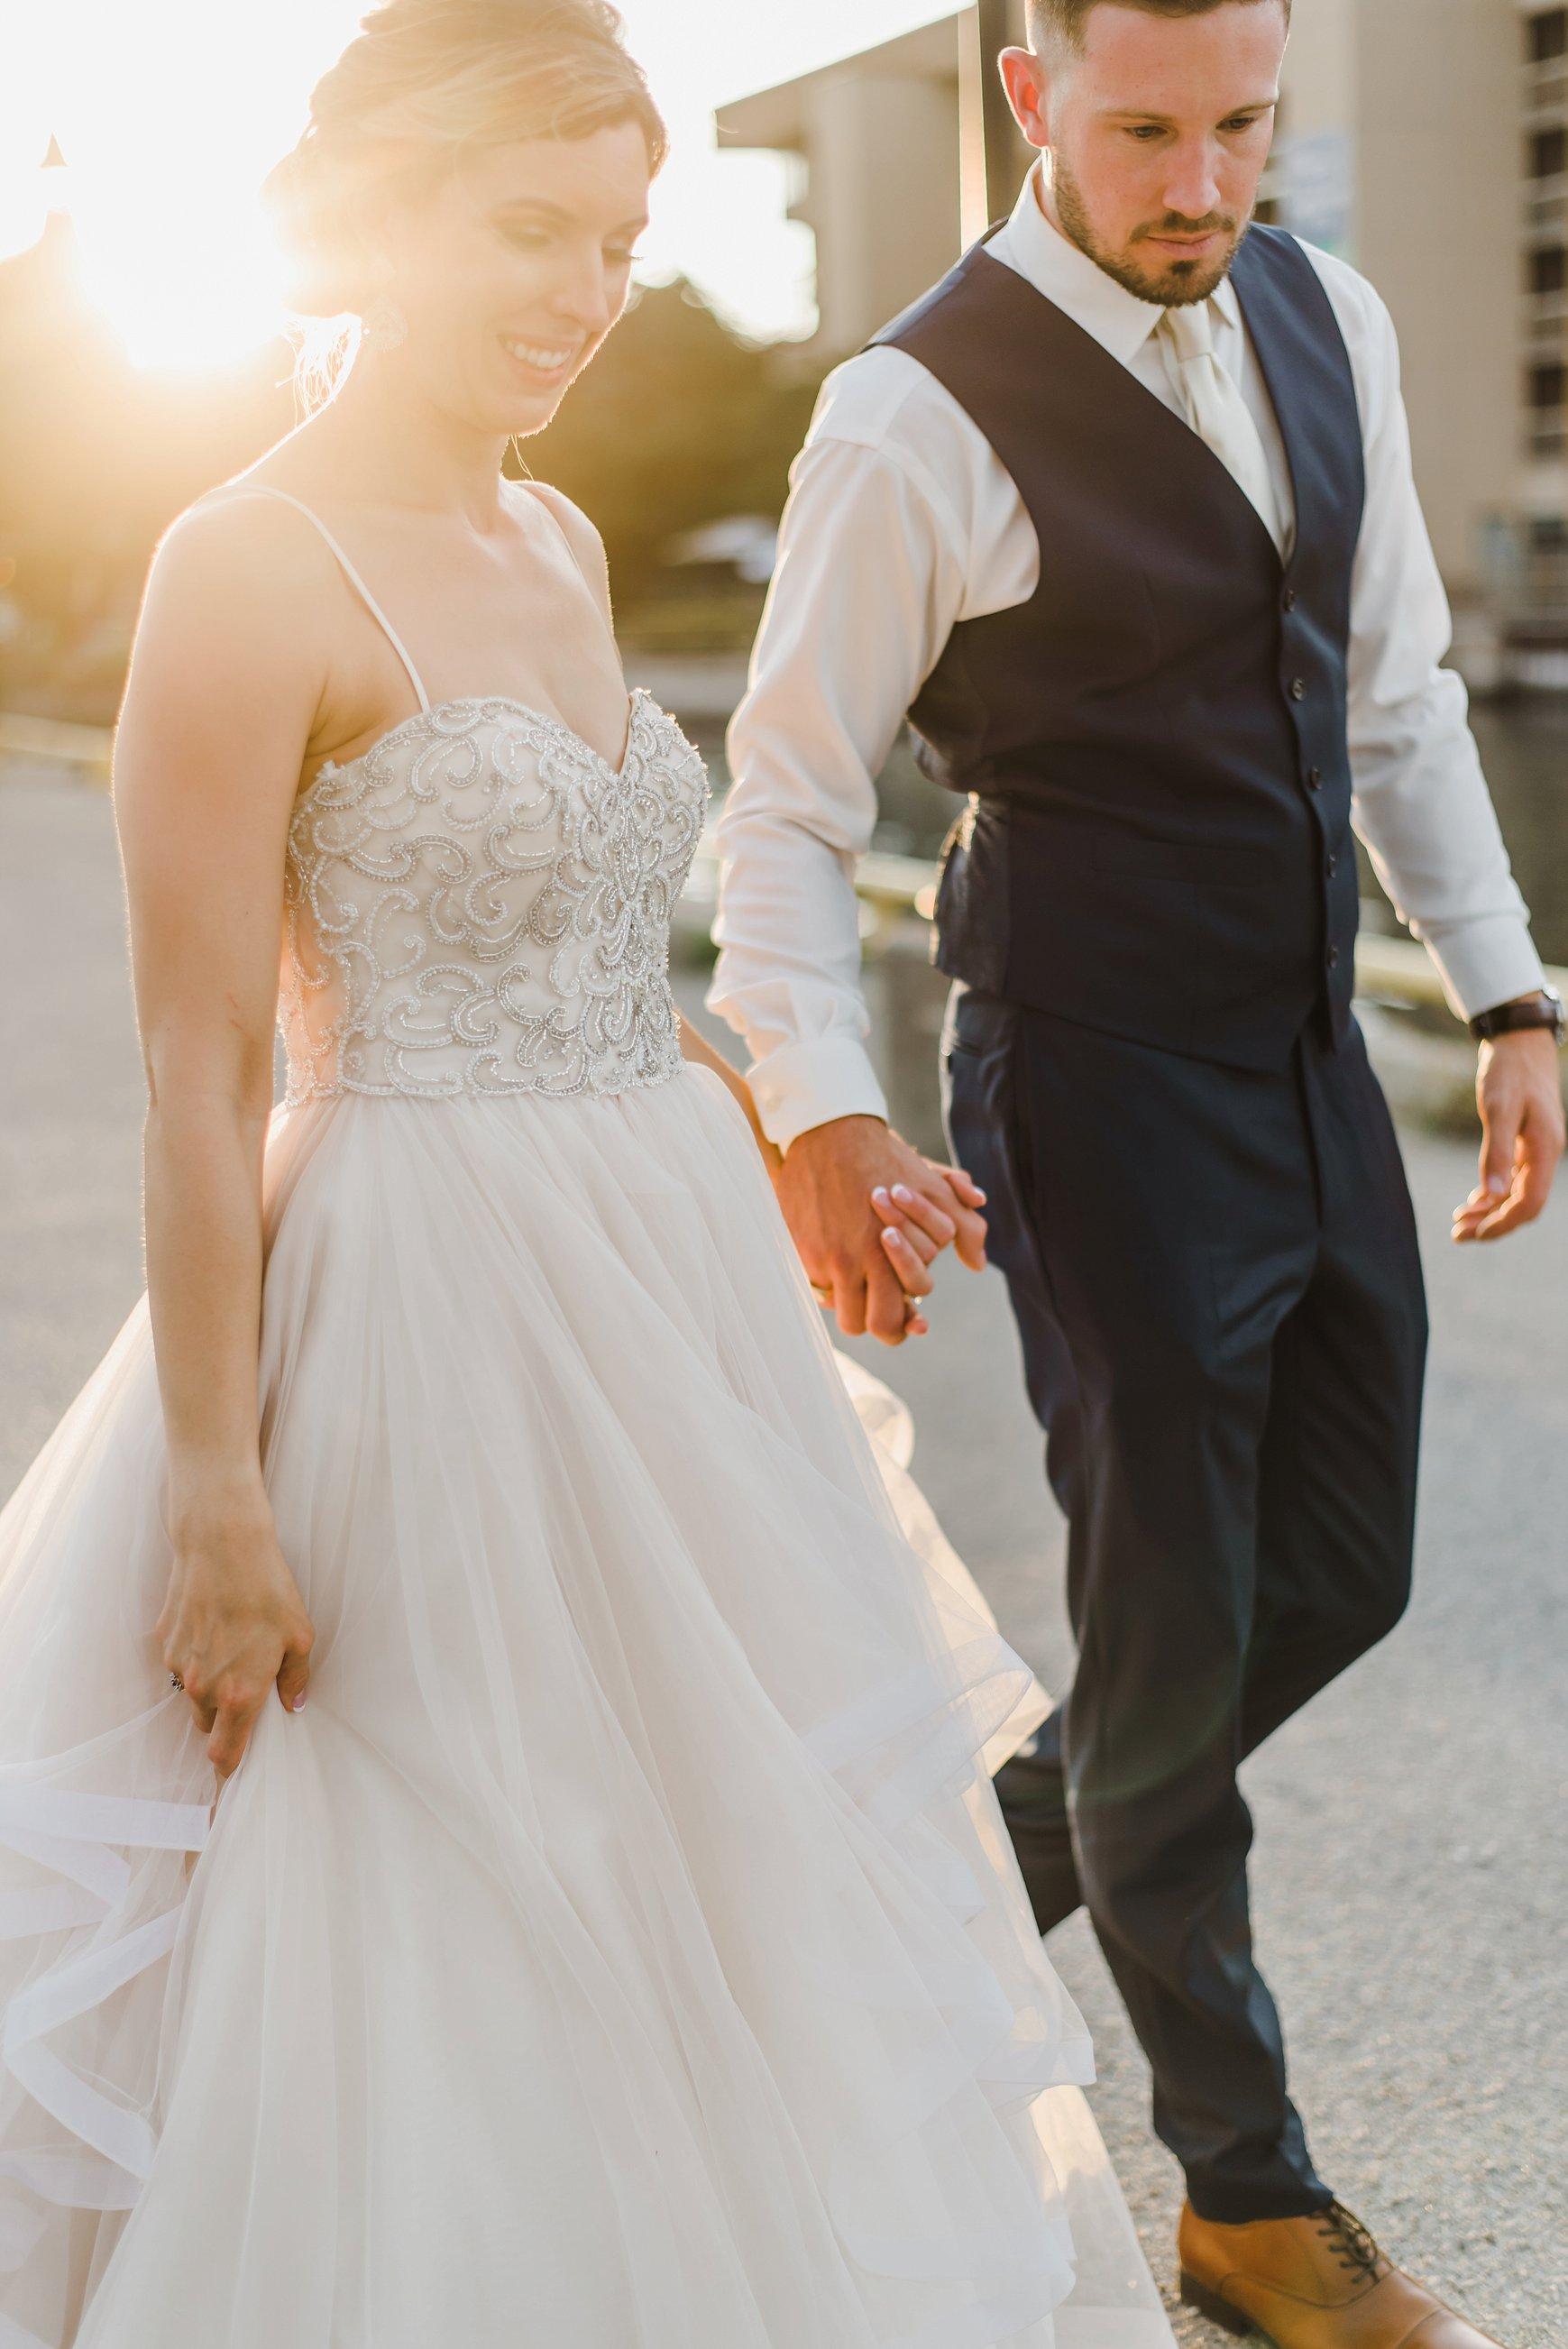 light airy indie fine art ottawa wedding photographer | Ali and Batoul Photography_0239.jpg